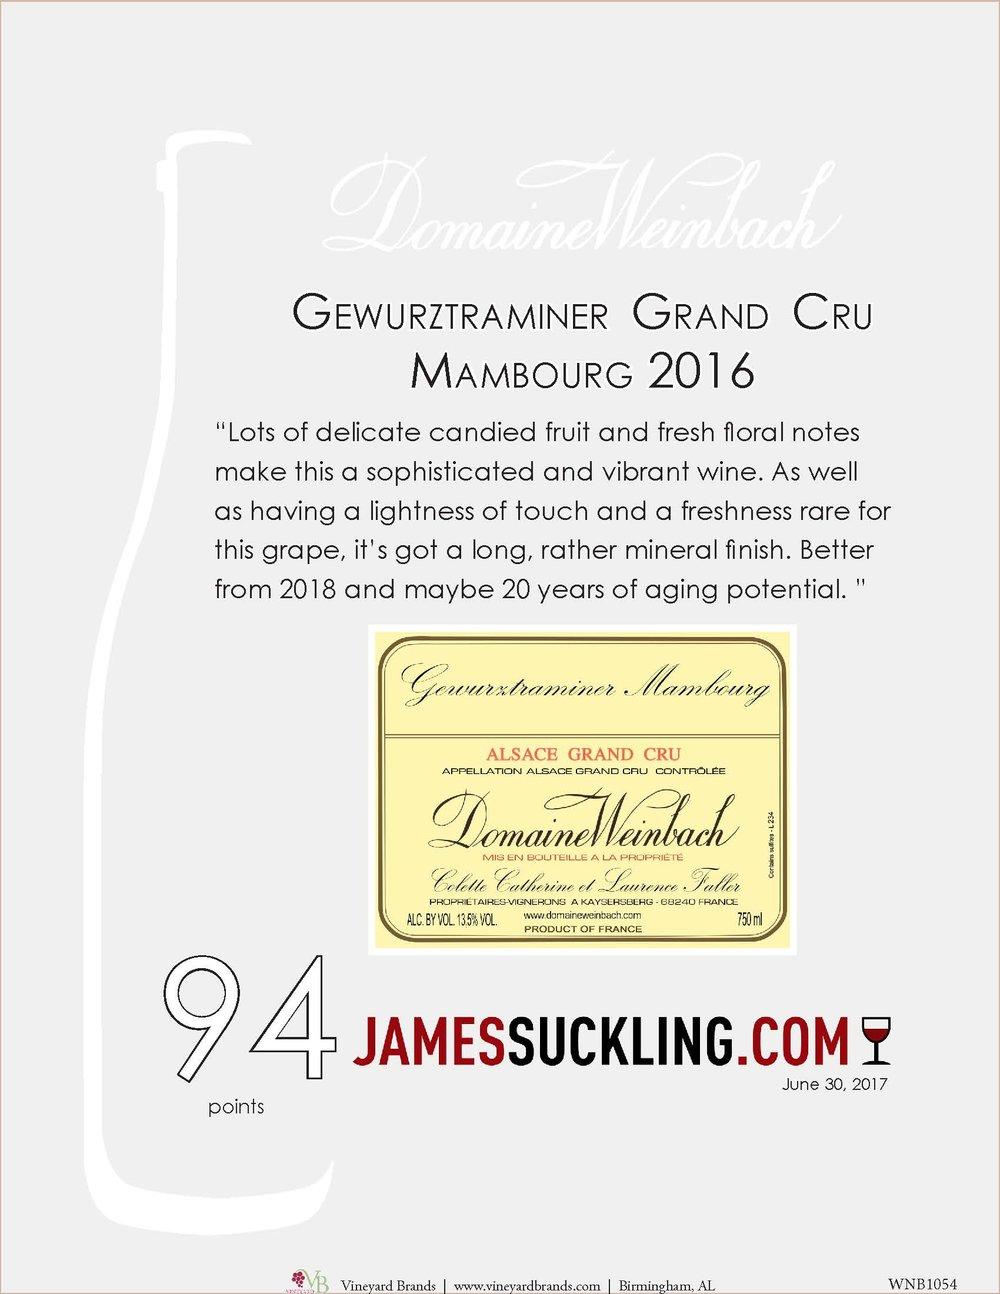 Gewurztraminer Grand Cru Mambourg 2016.jpg